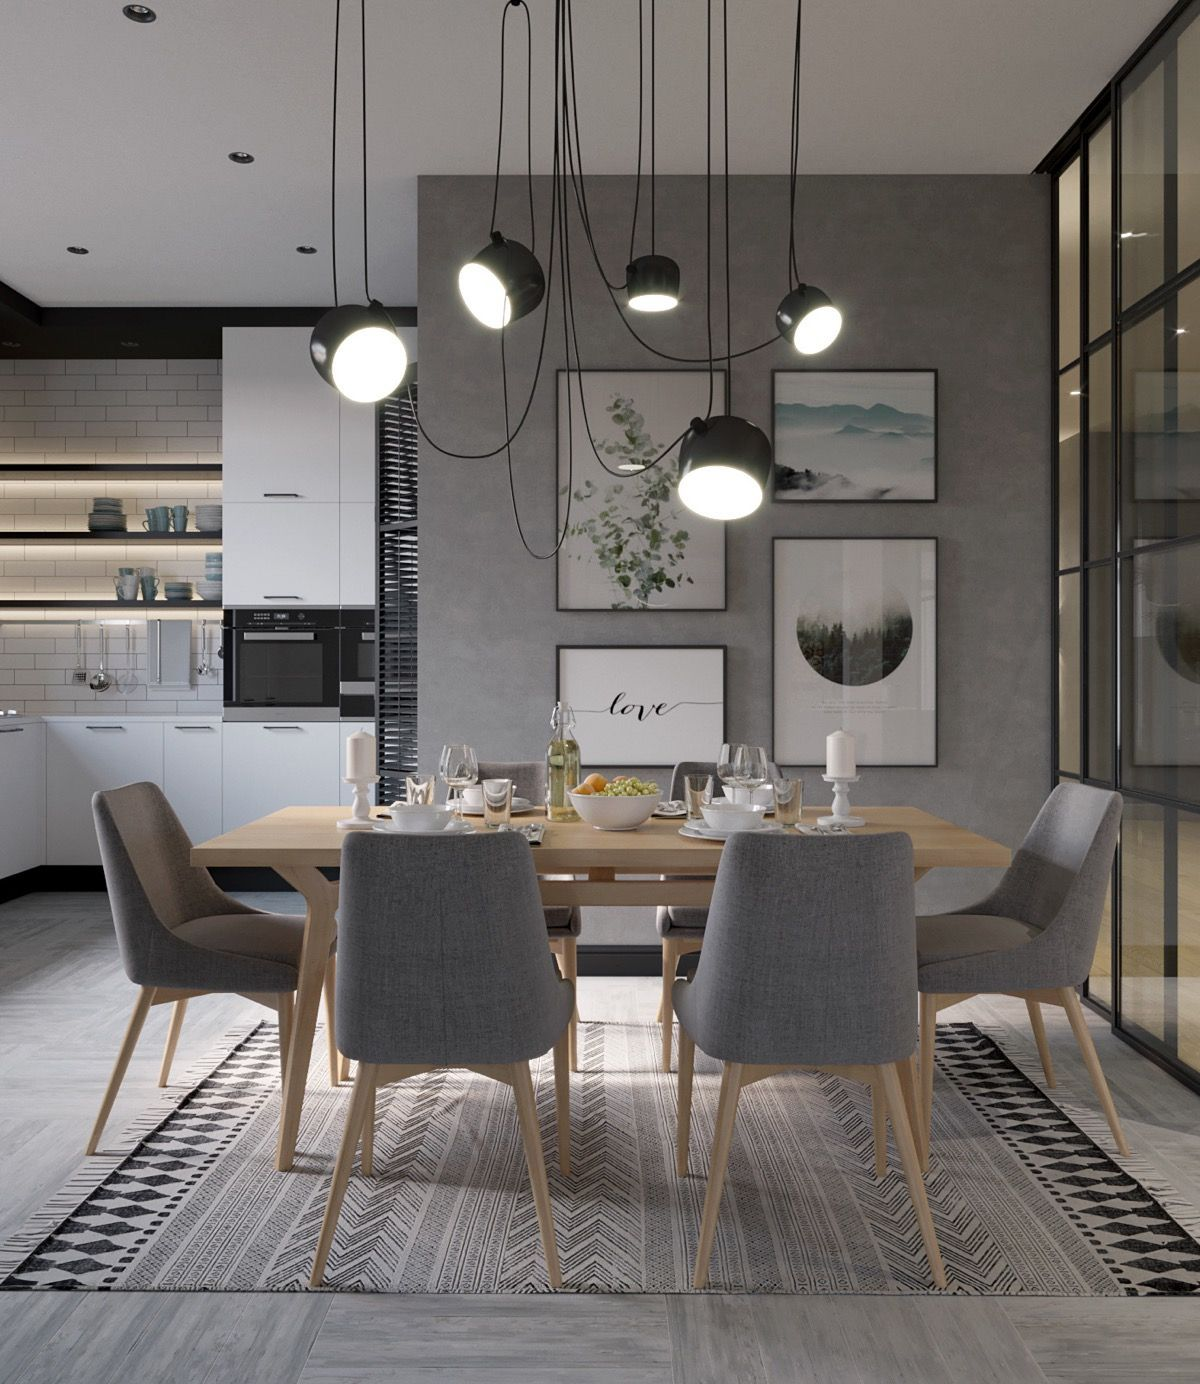 Aim Multi Light Pendant For Flos Lighting Pl364 3 Dining Room Design Modern Interior Design Dining Room Grey Dining Room Dining room design gray